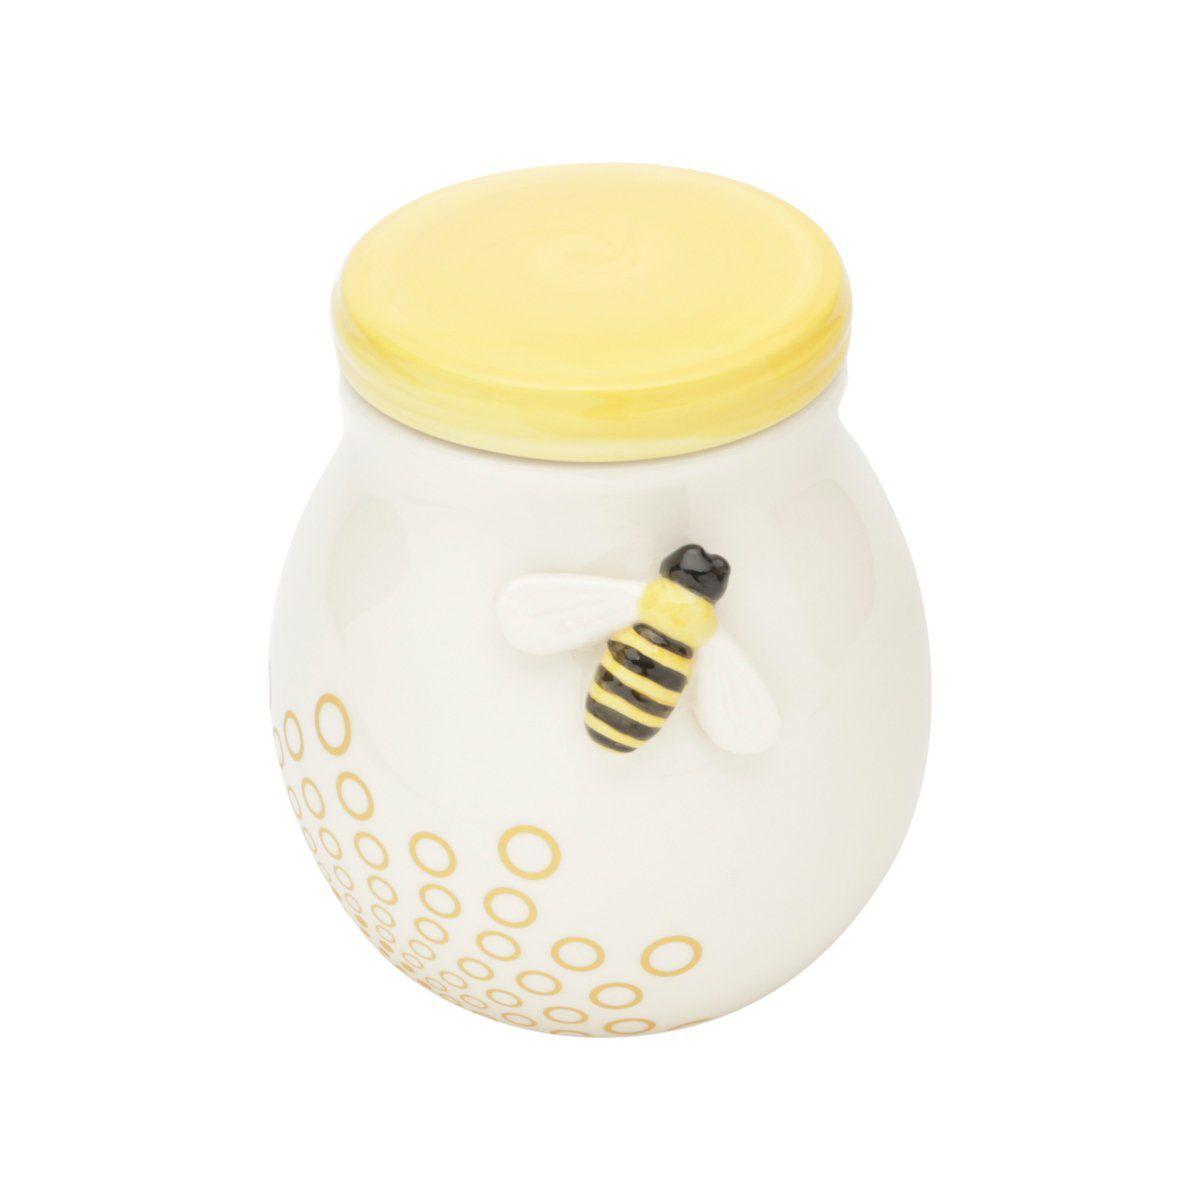 Pote decorativo 11,8 cm de cerâmica branca e amarela Abelha Lyor - L64019